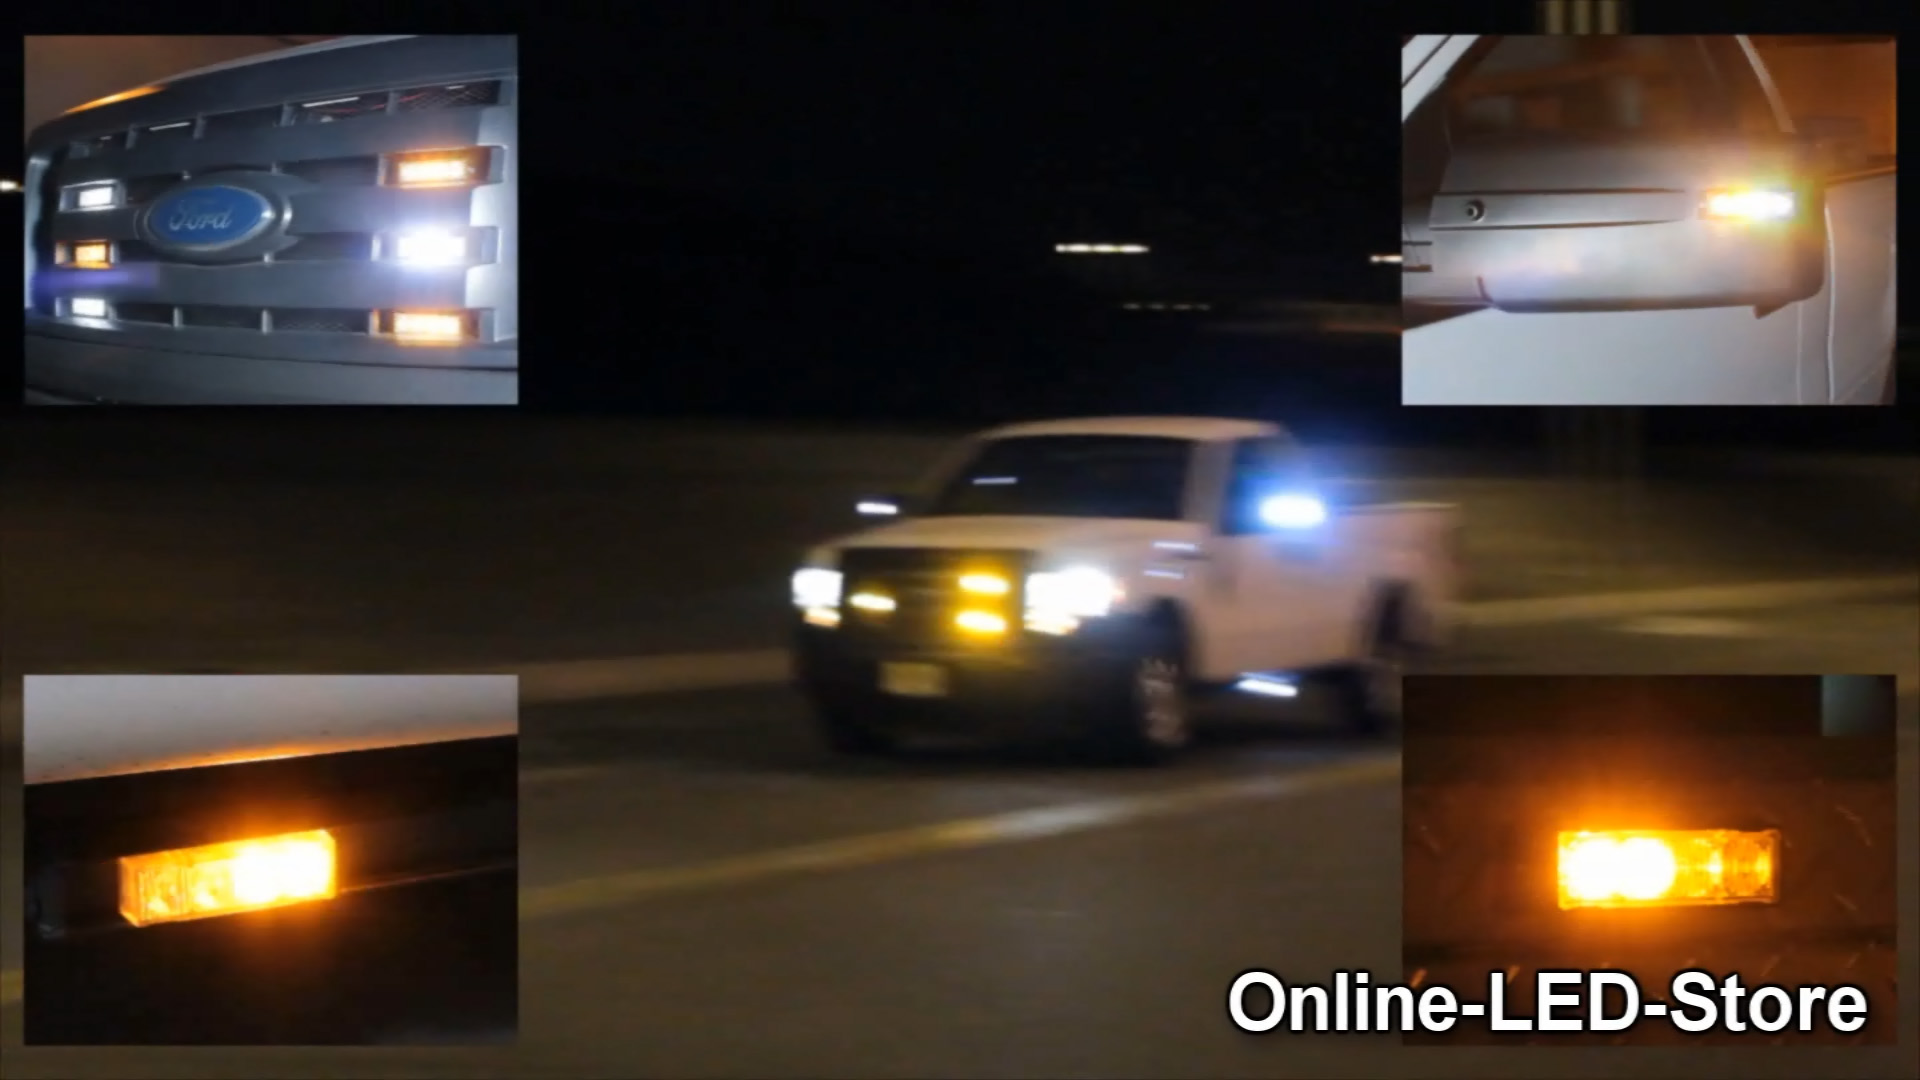 3e192651844ac7cf33f7c4abaff3e92b5794805a?image_crop_resized=274x154 video gallery led vehicle lights online led store com online led store fuse box at bakdesigns.co